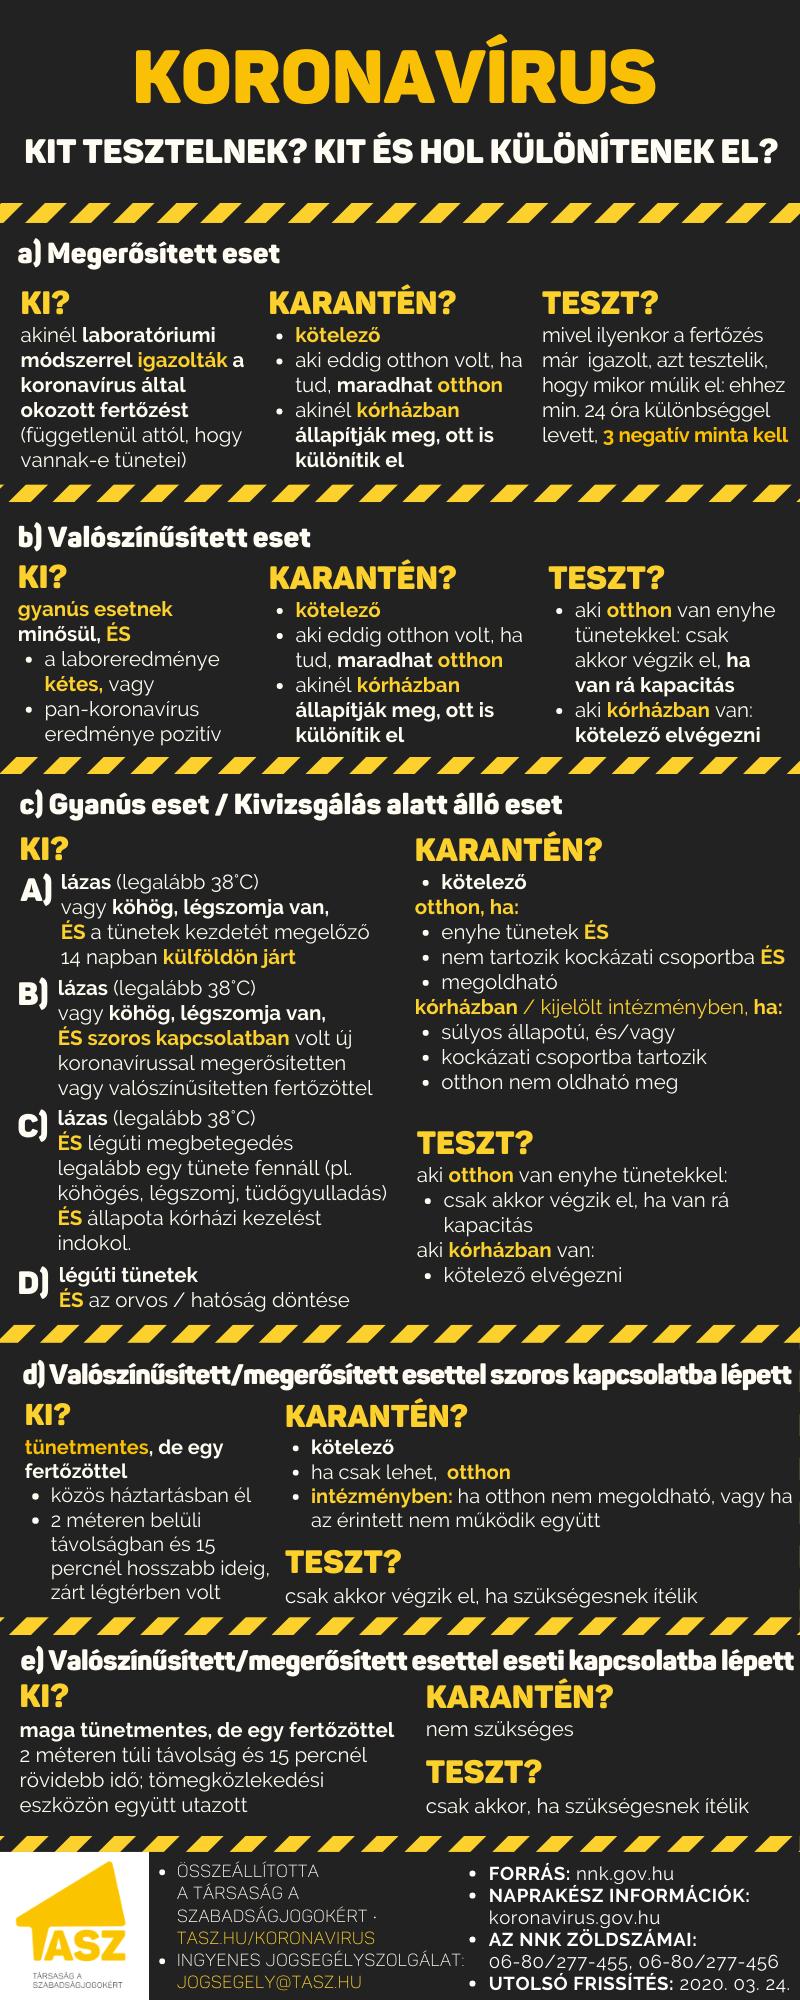 koronavirus_eljarasrend_kat_jav2.png